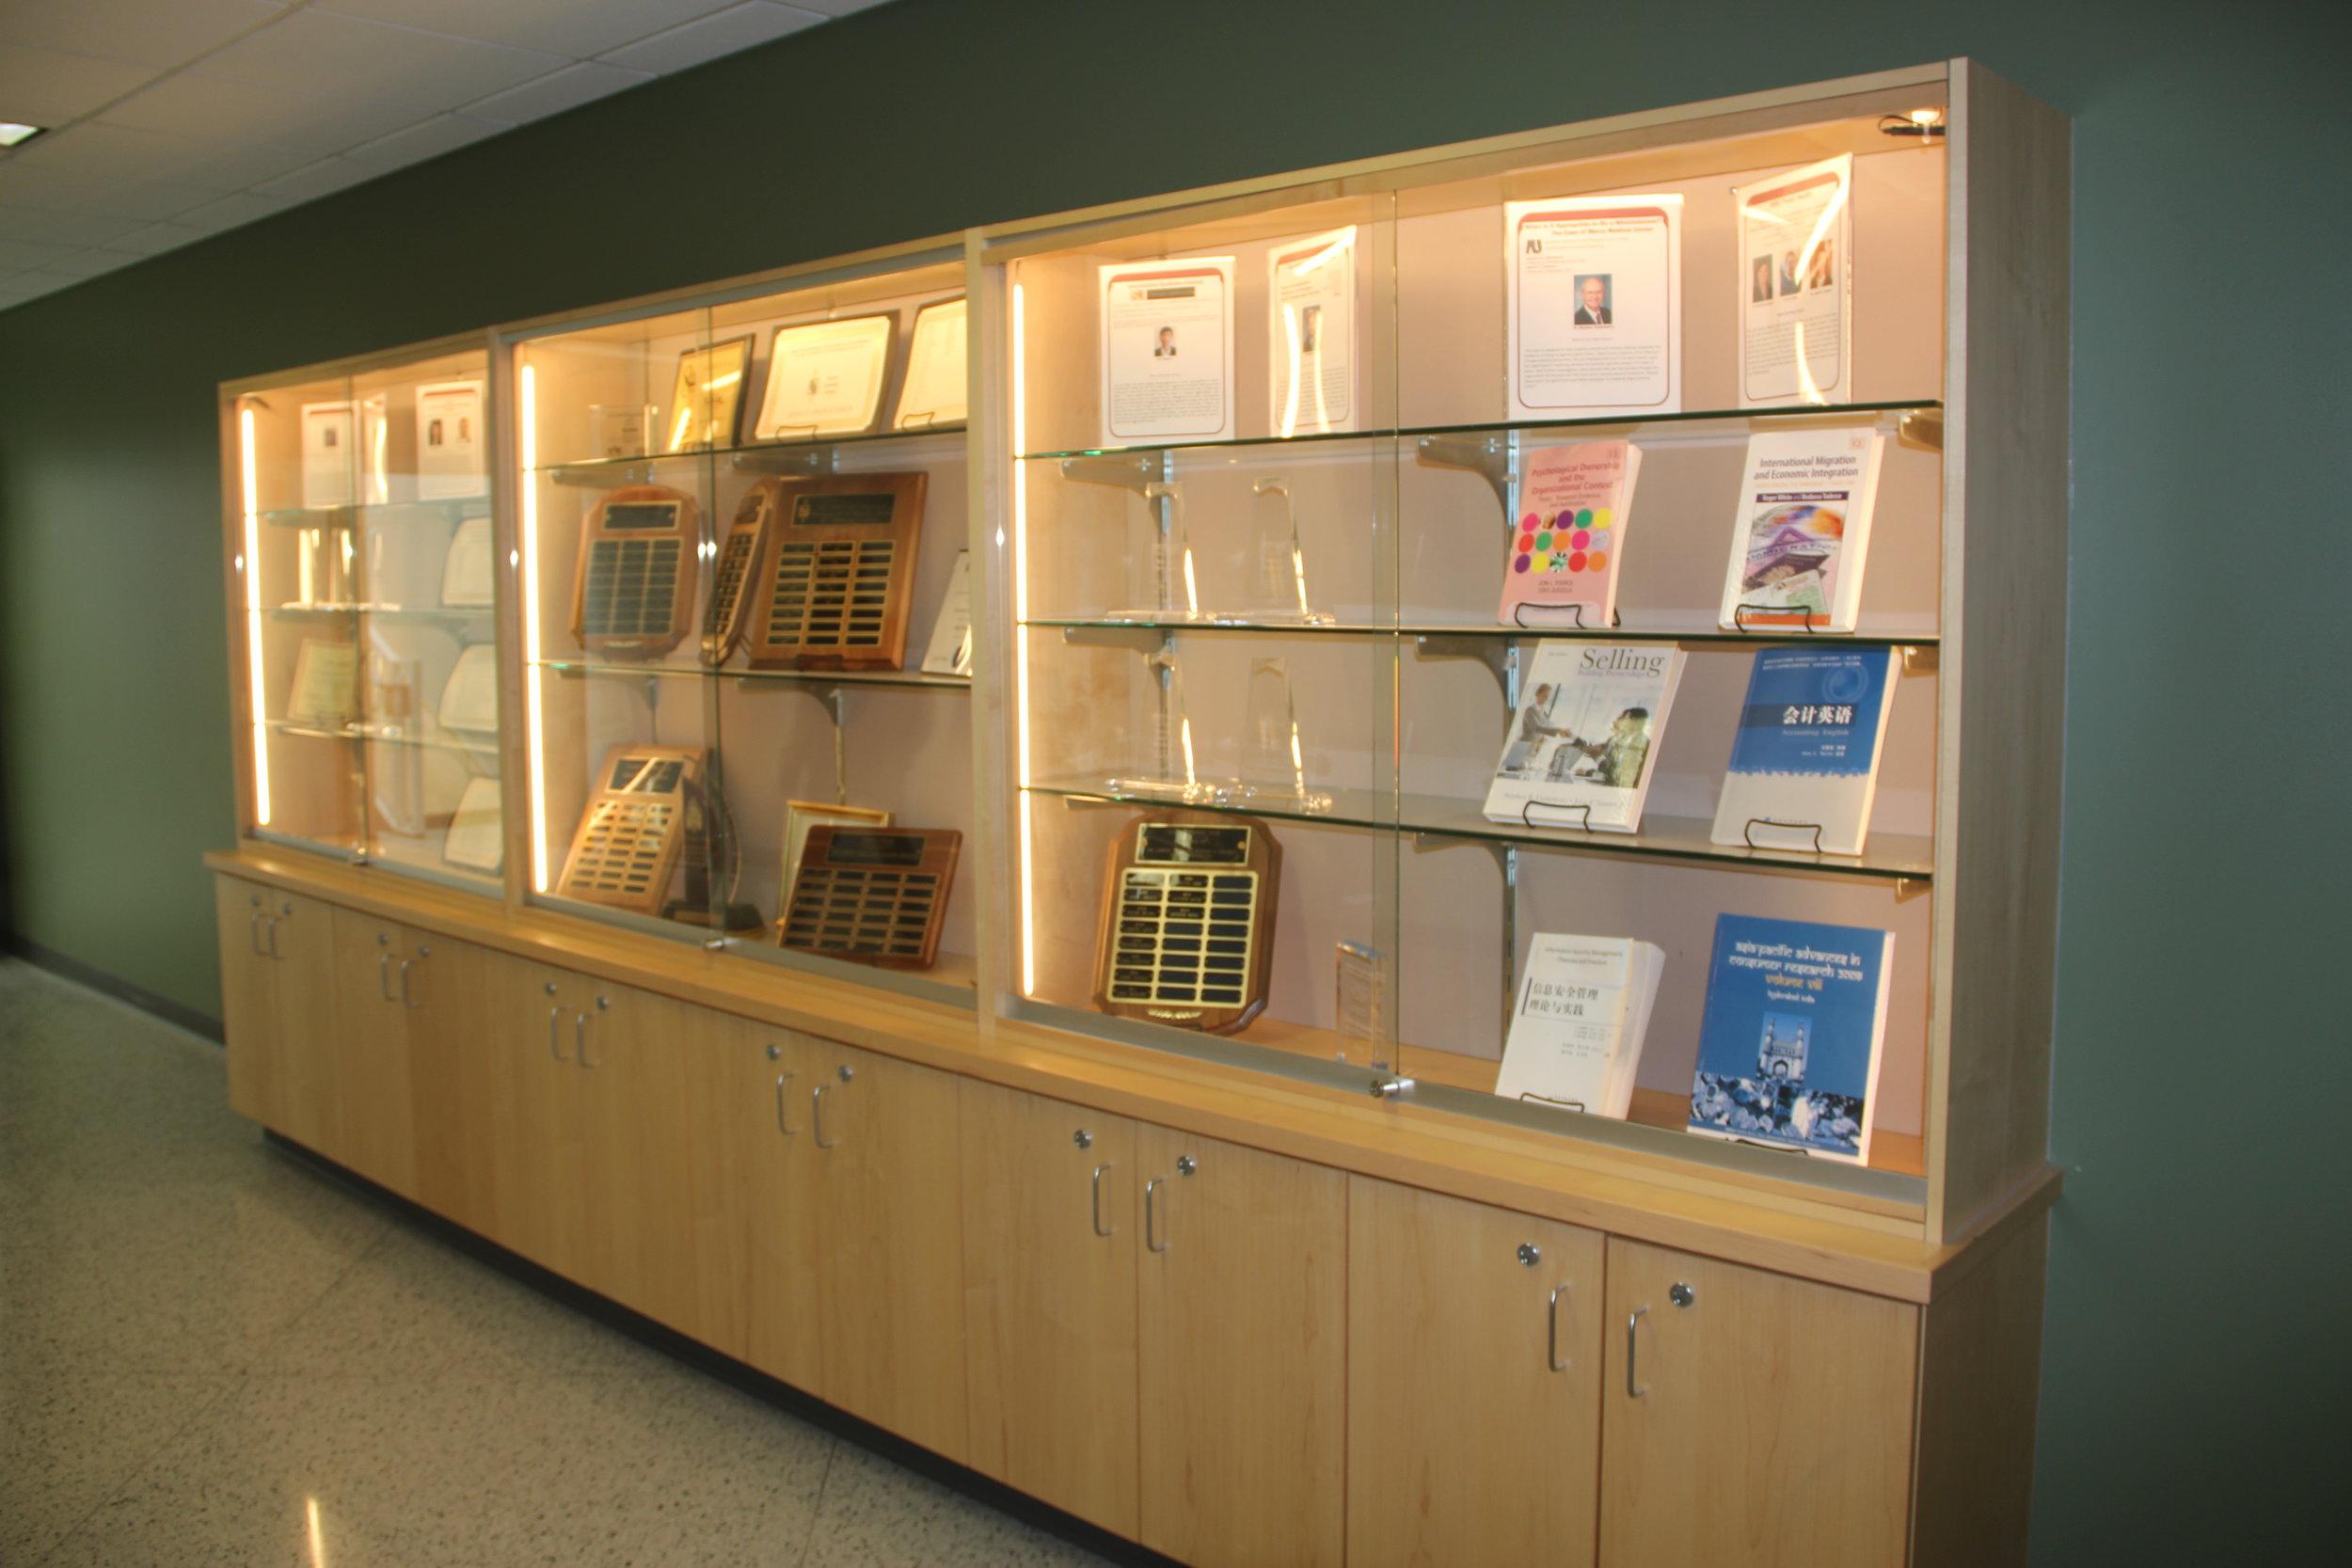 LSBE award display cases holding twenty-five years of accomplishments.Photo: Tyler Schendel